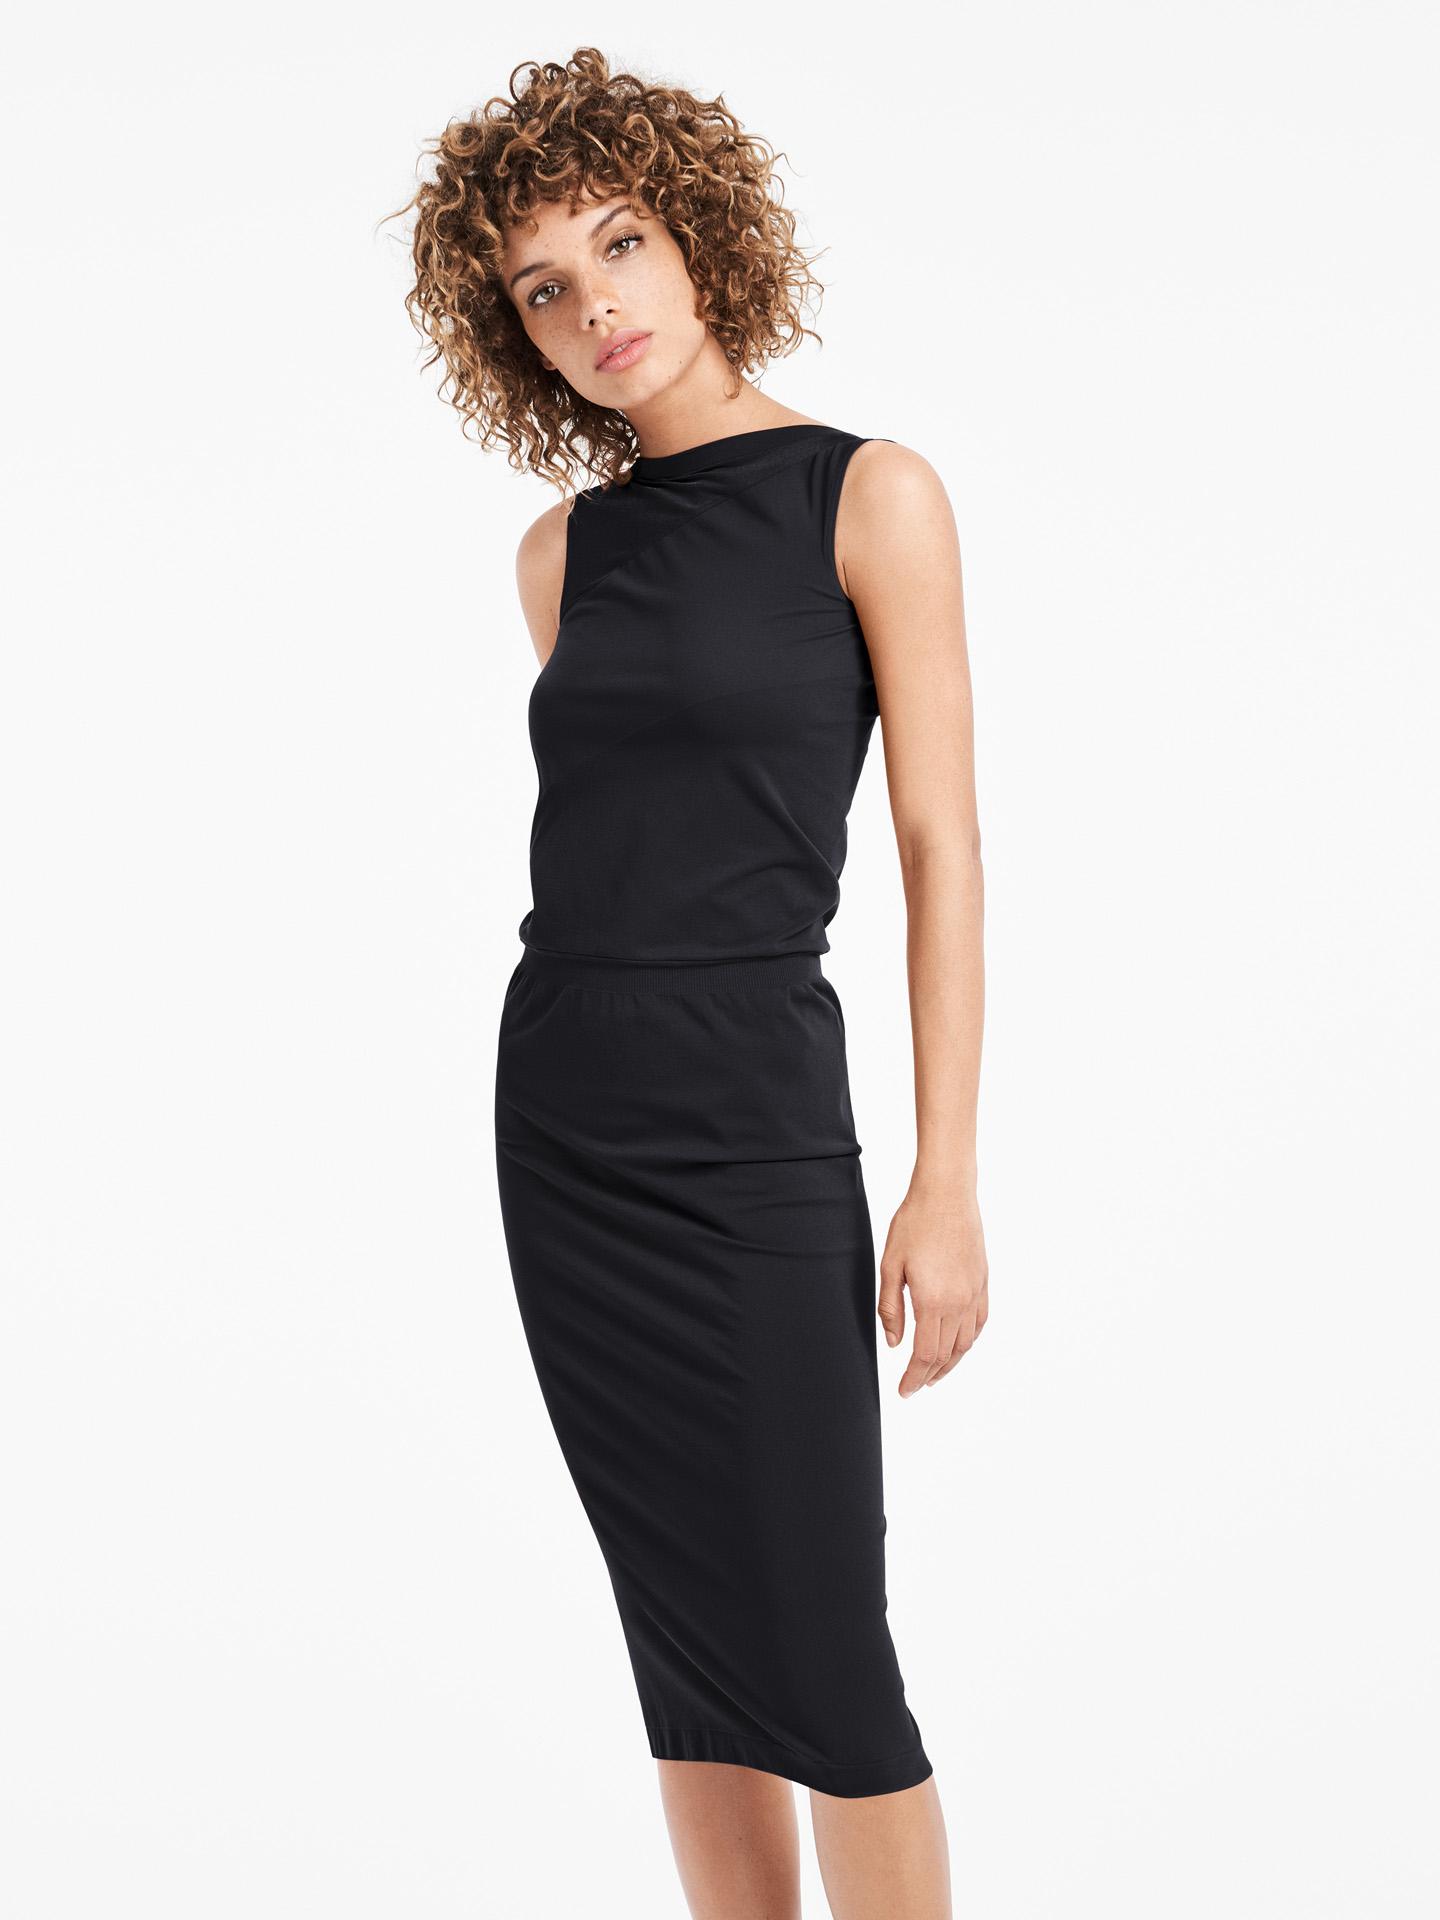 Wolford Apparel & Accessories > Clothing > Abbigliamento Donna Python Dress